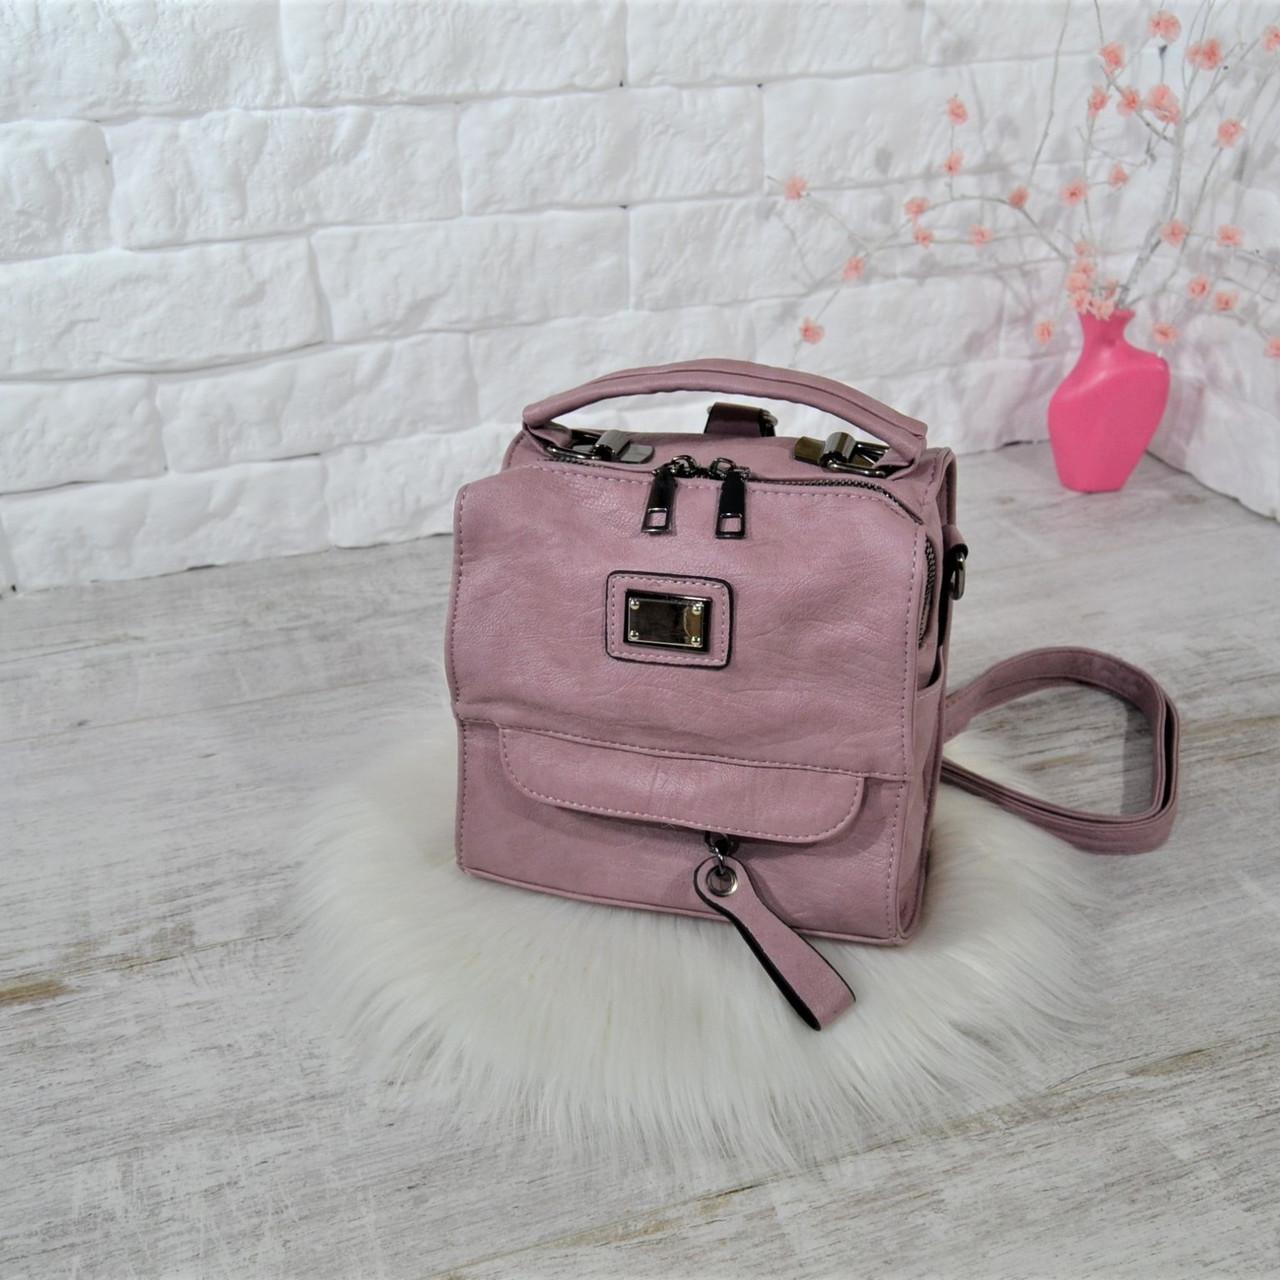 Сумка-рюкзак Fashion Lusha Компакт городская женская сиреневая